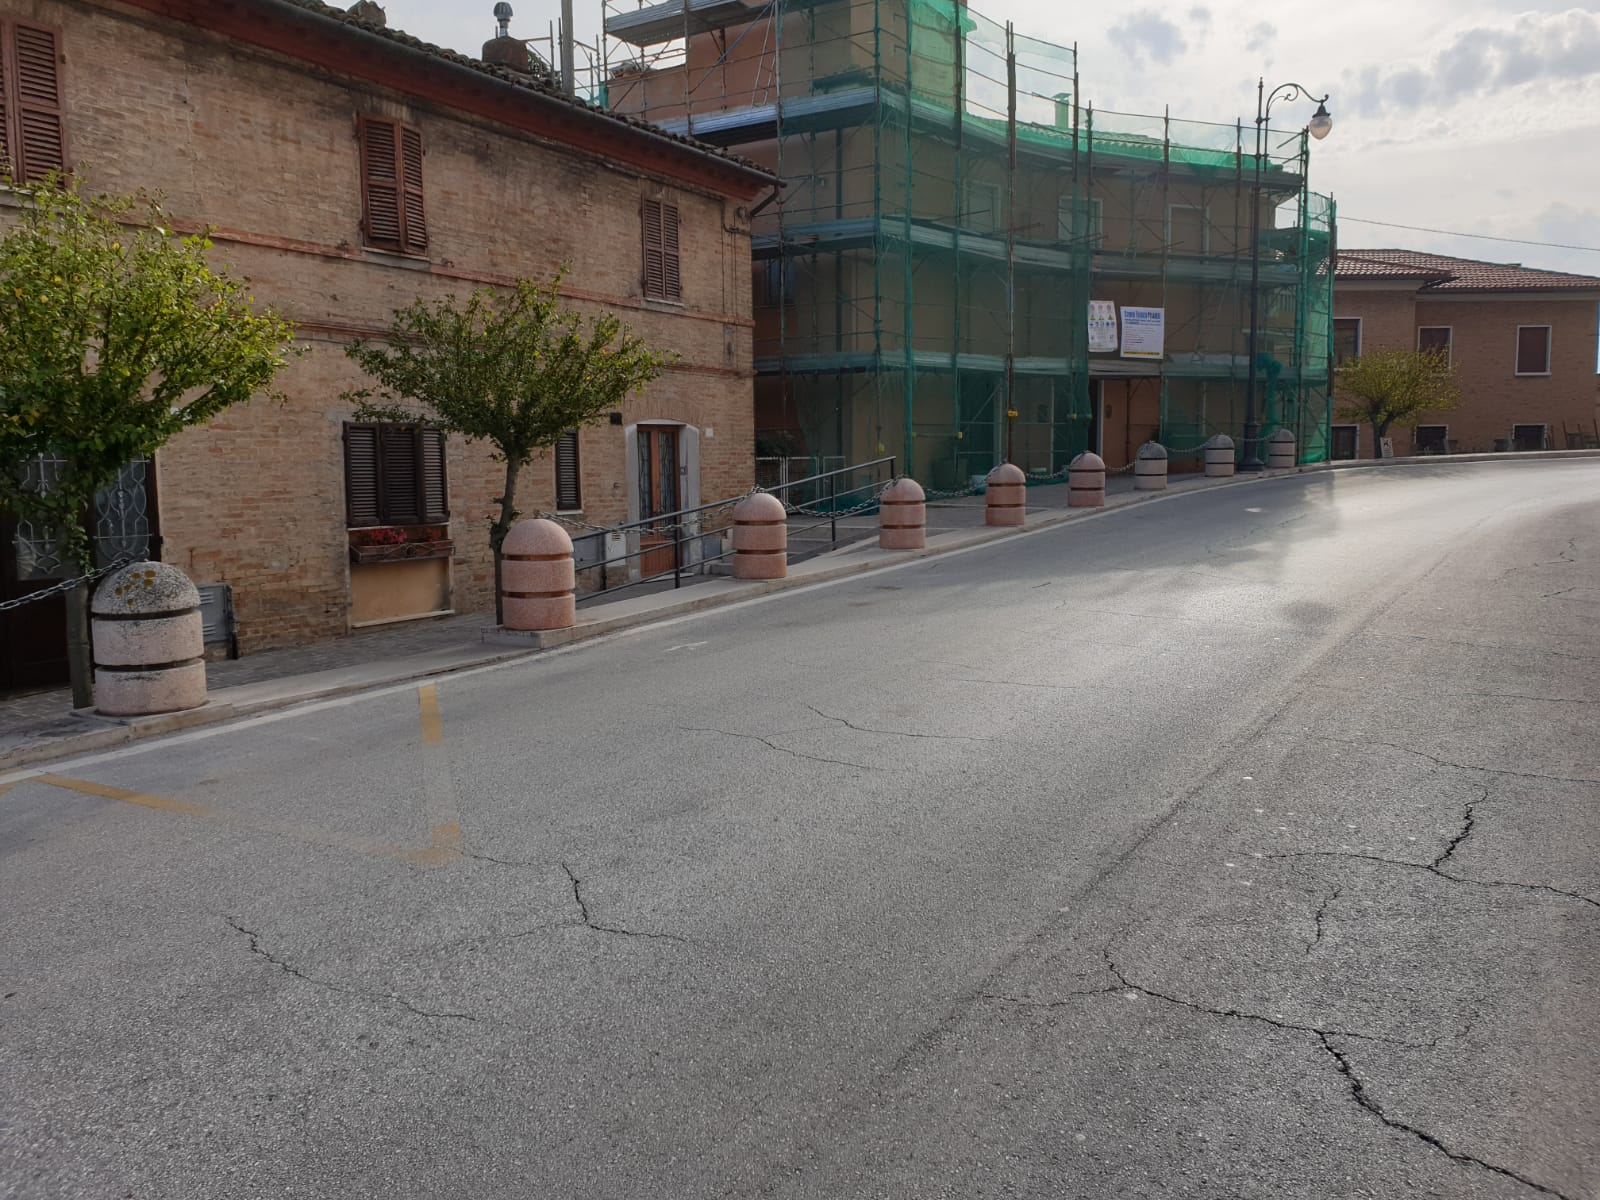 Ripristino arredo urbano post incidente Osimo (Ancona) - dopo 2